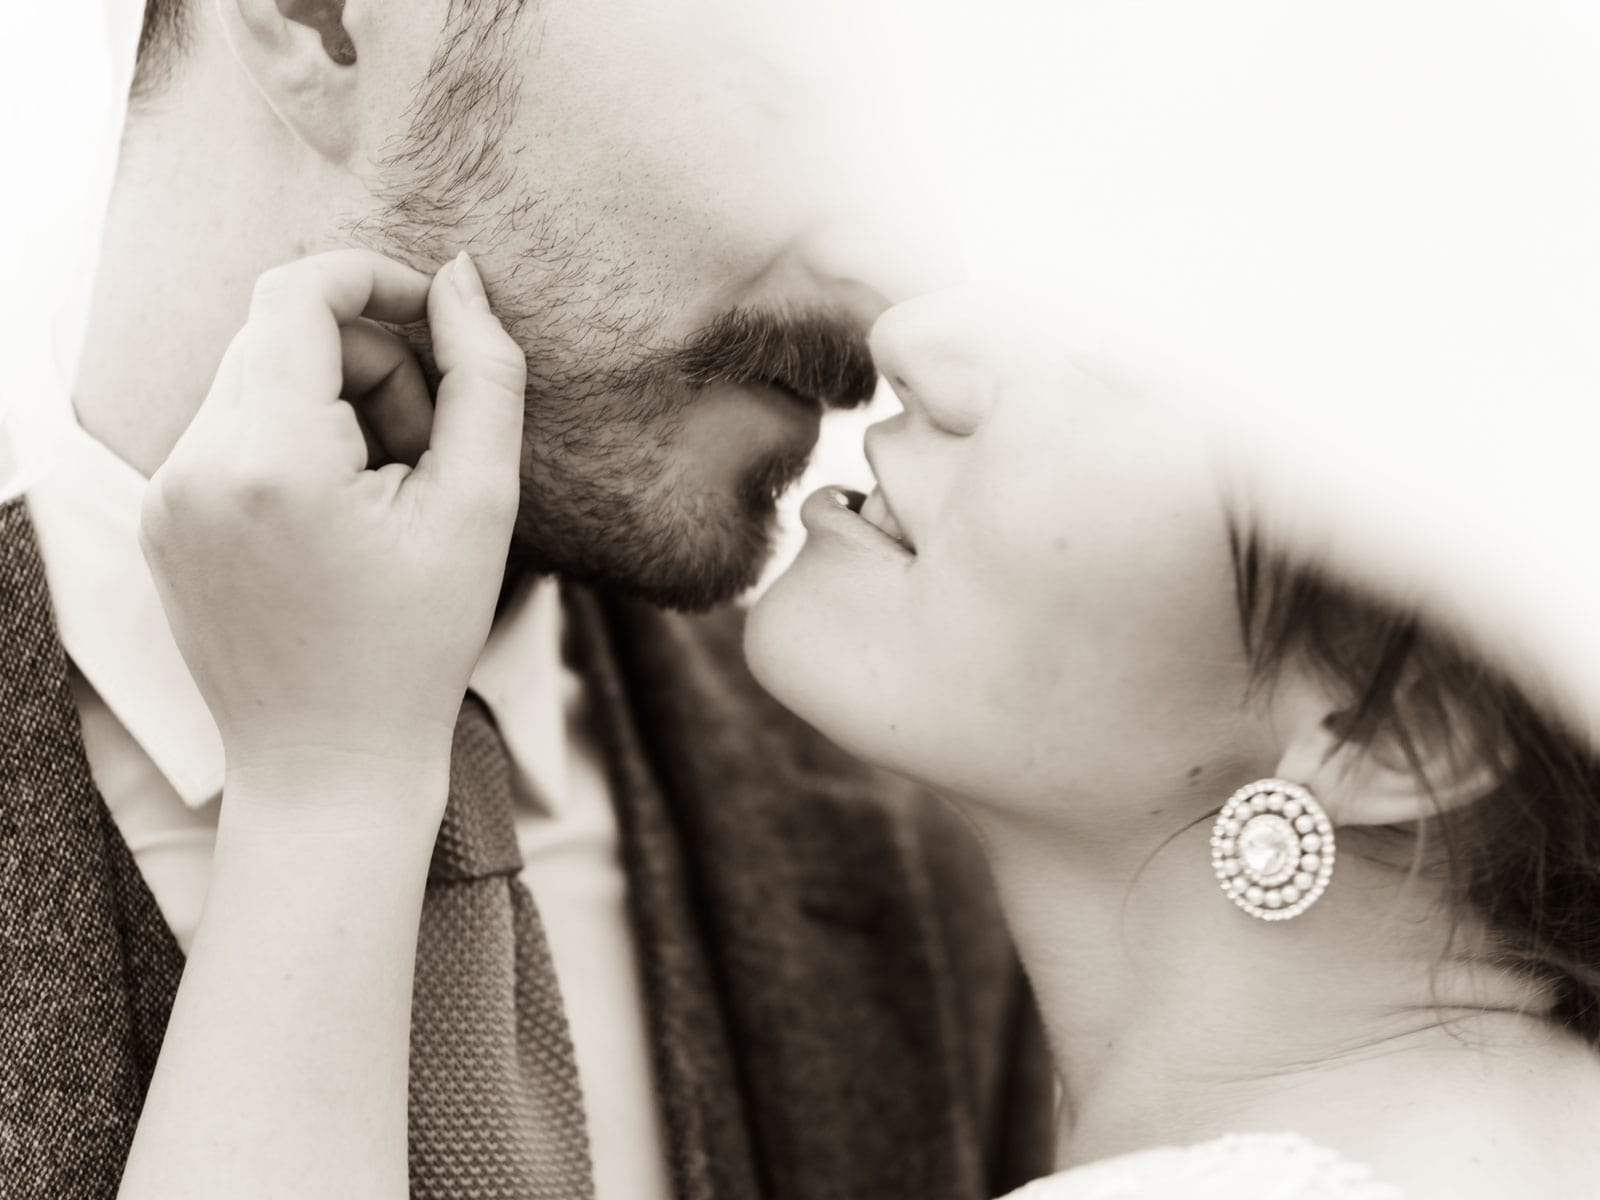 Wedding photoshoot, bride and groom under the bridal veil, wedding photography Staffordshire